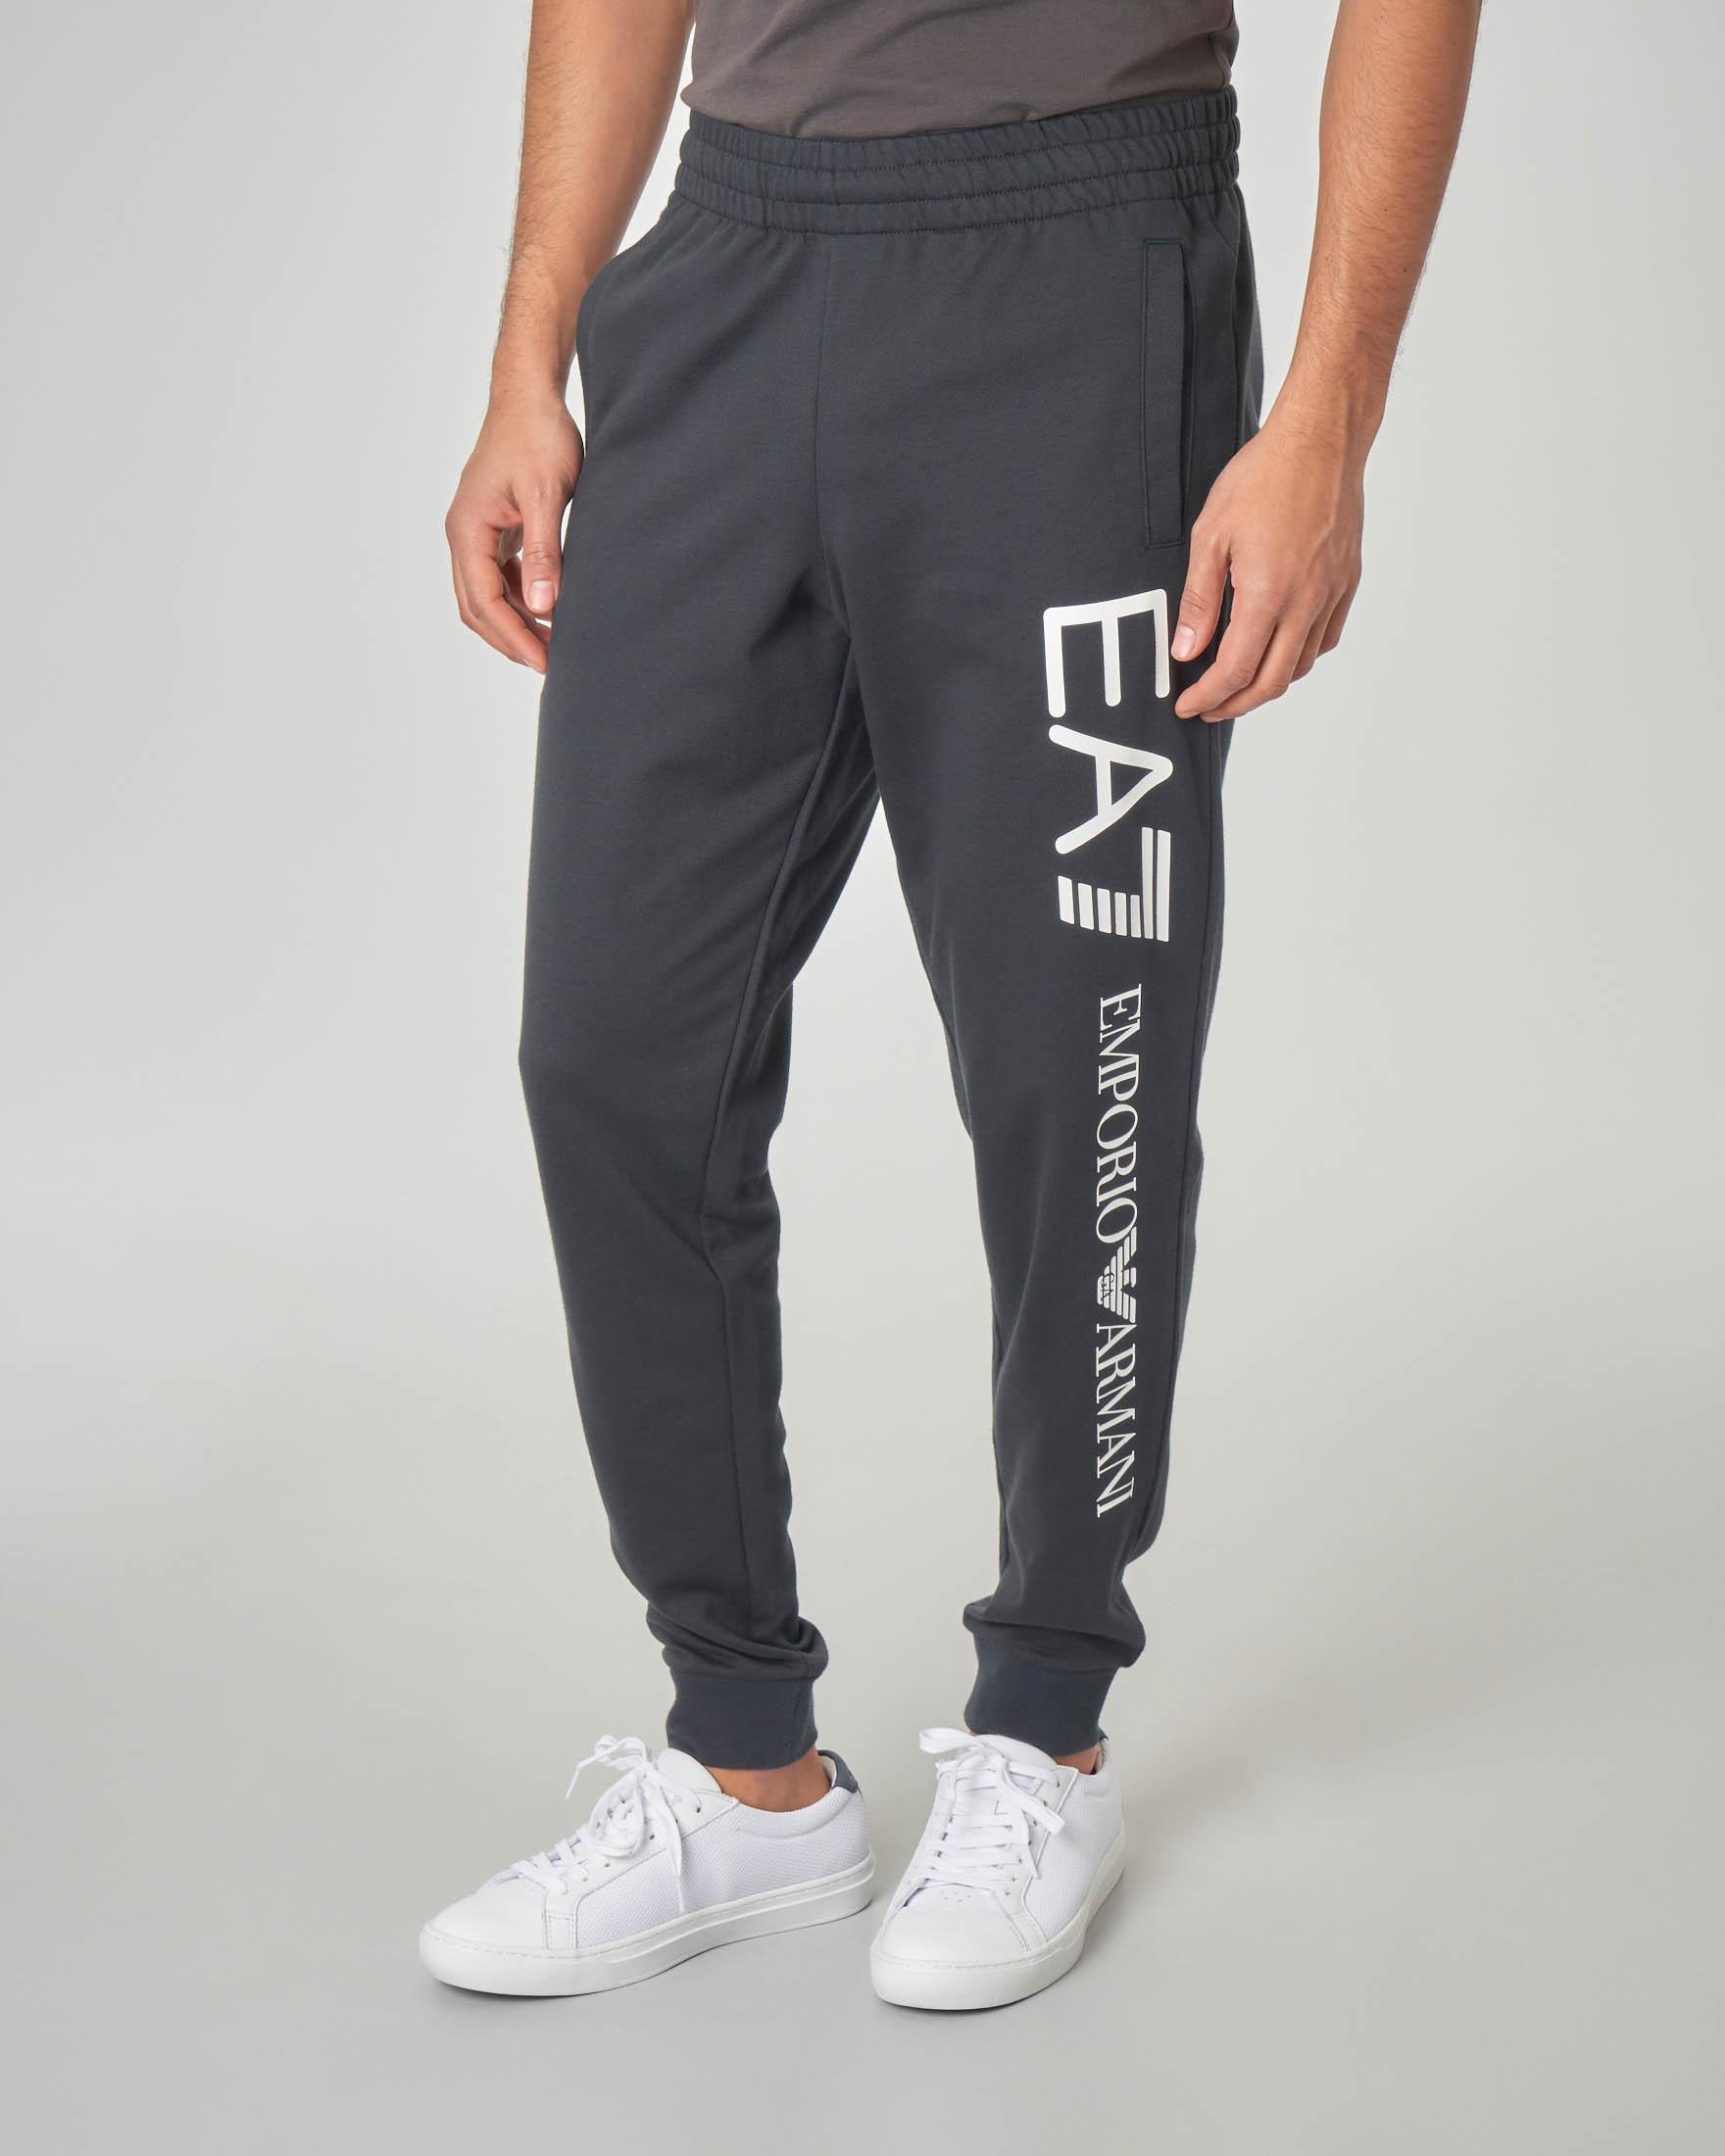 Pantalone blu in felpa con maxi-logo